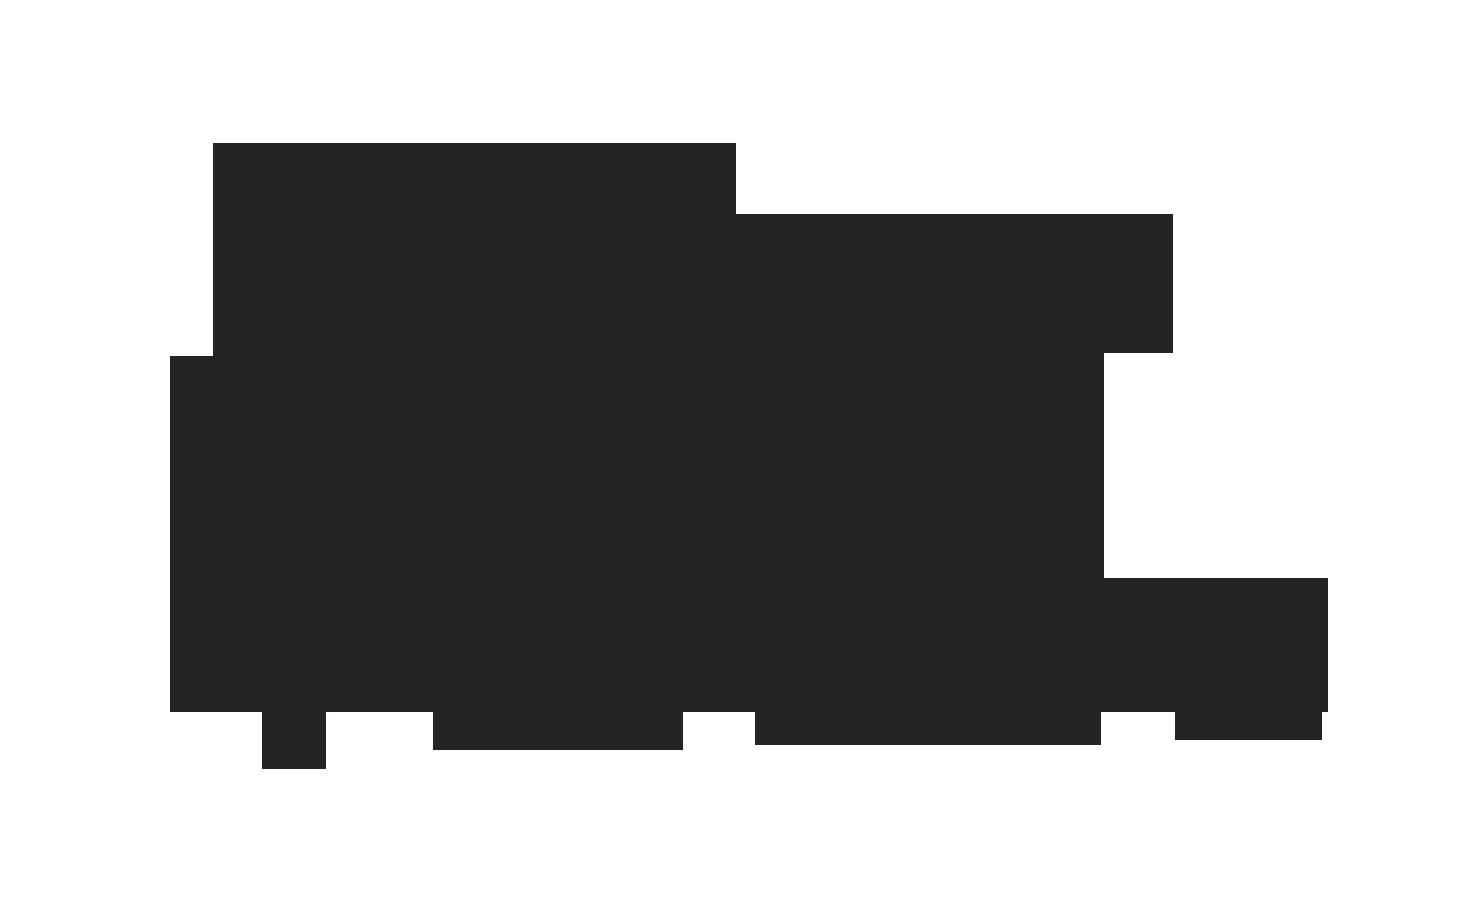 Oxana Frolova's Signature